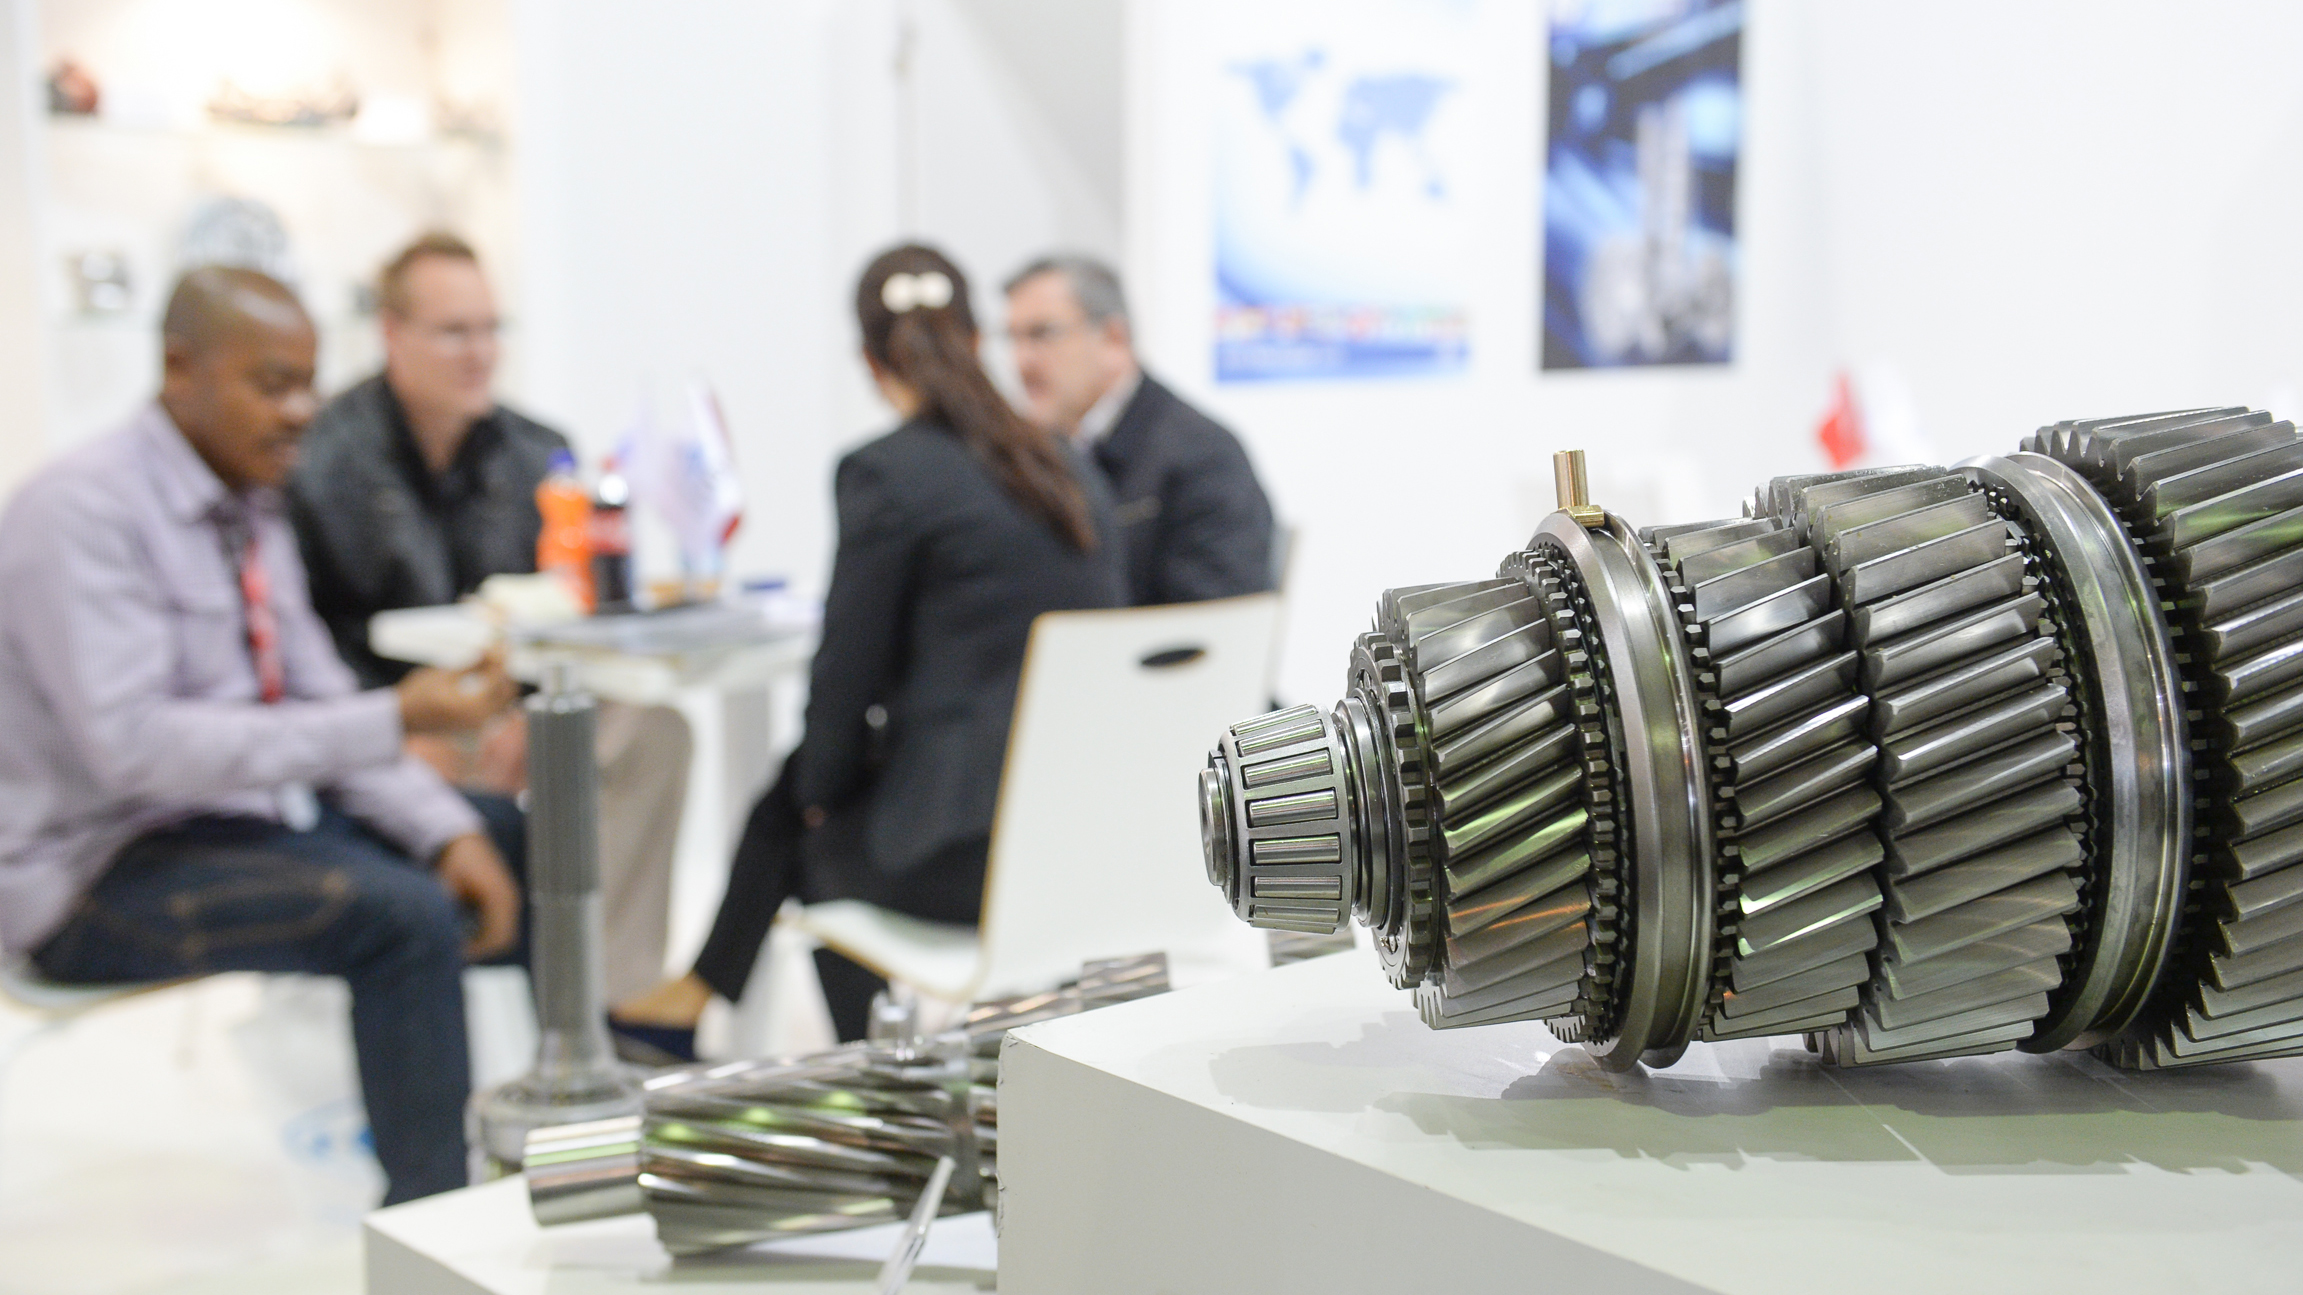 Automechanika - World's leading trade fair for the